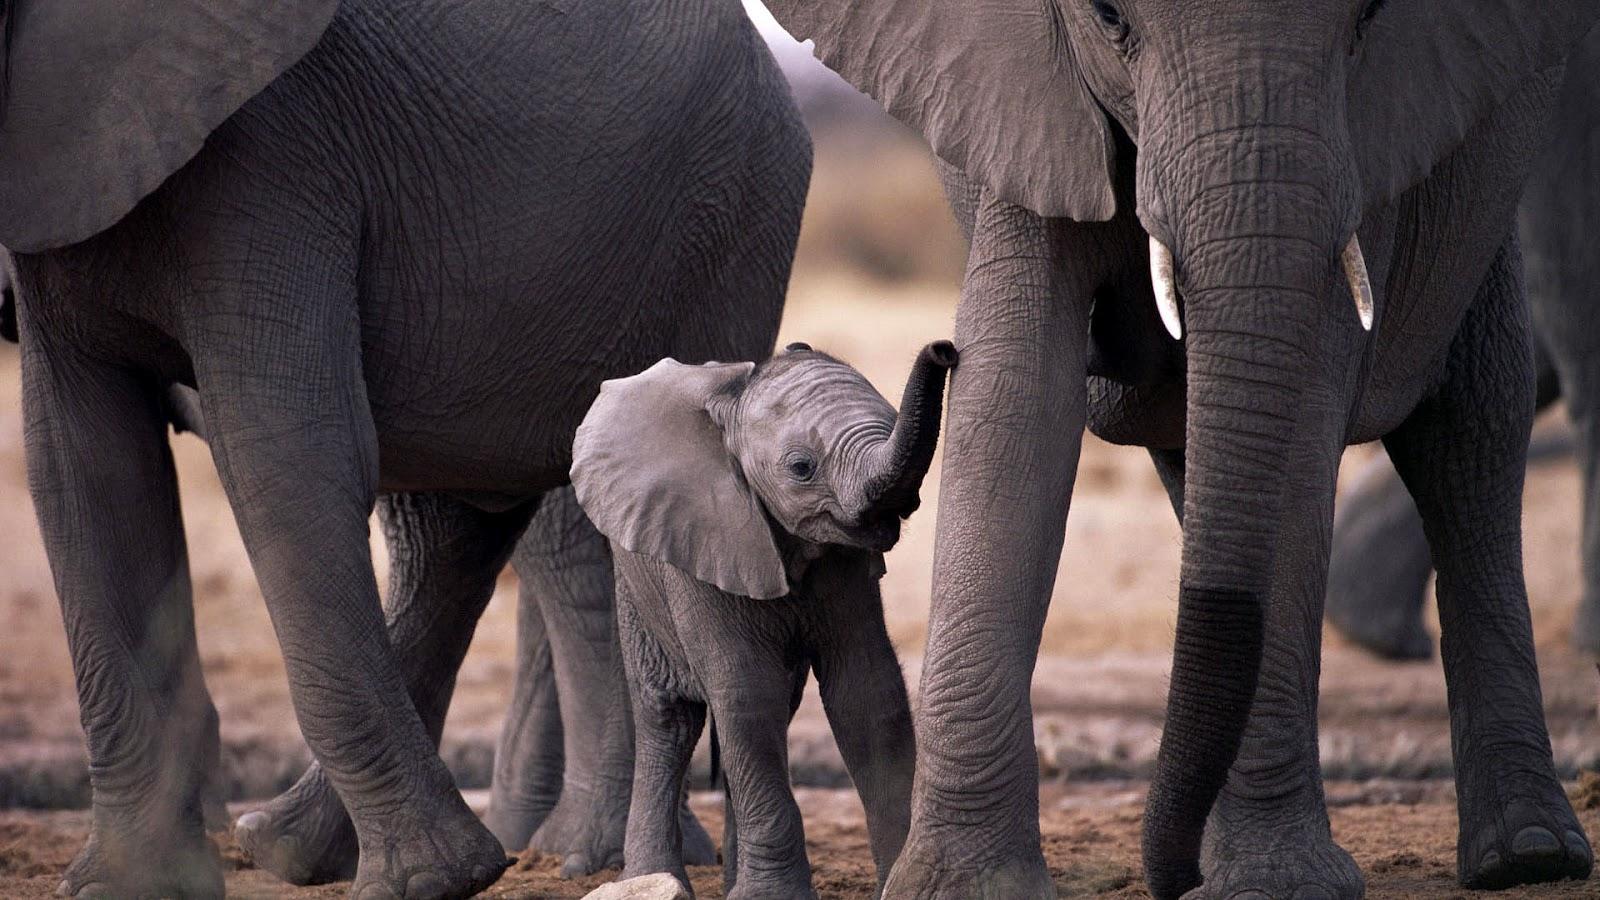 Baby elephant wallpaper 1600x900